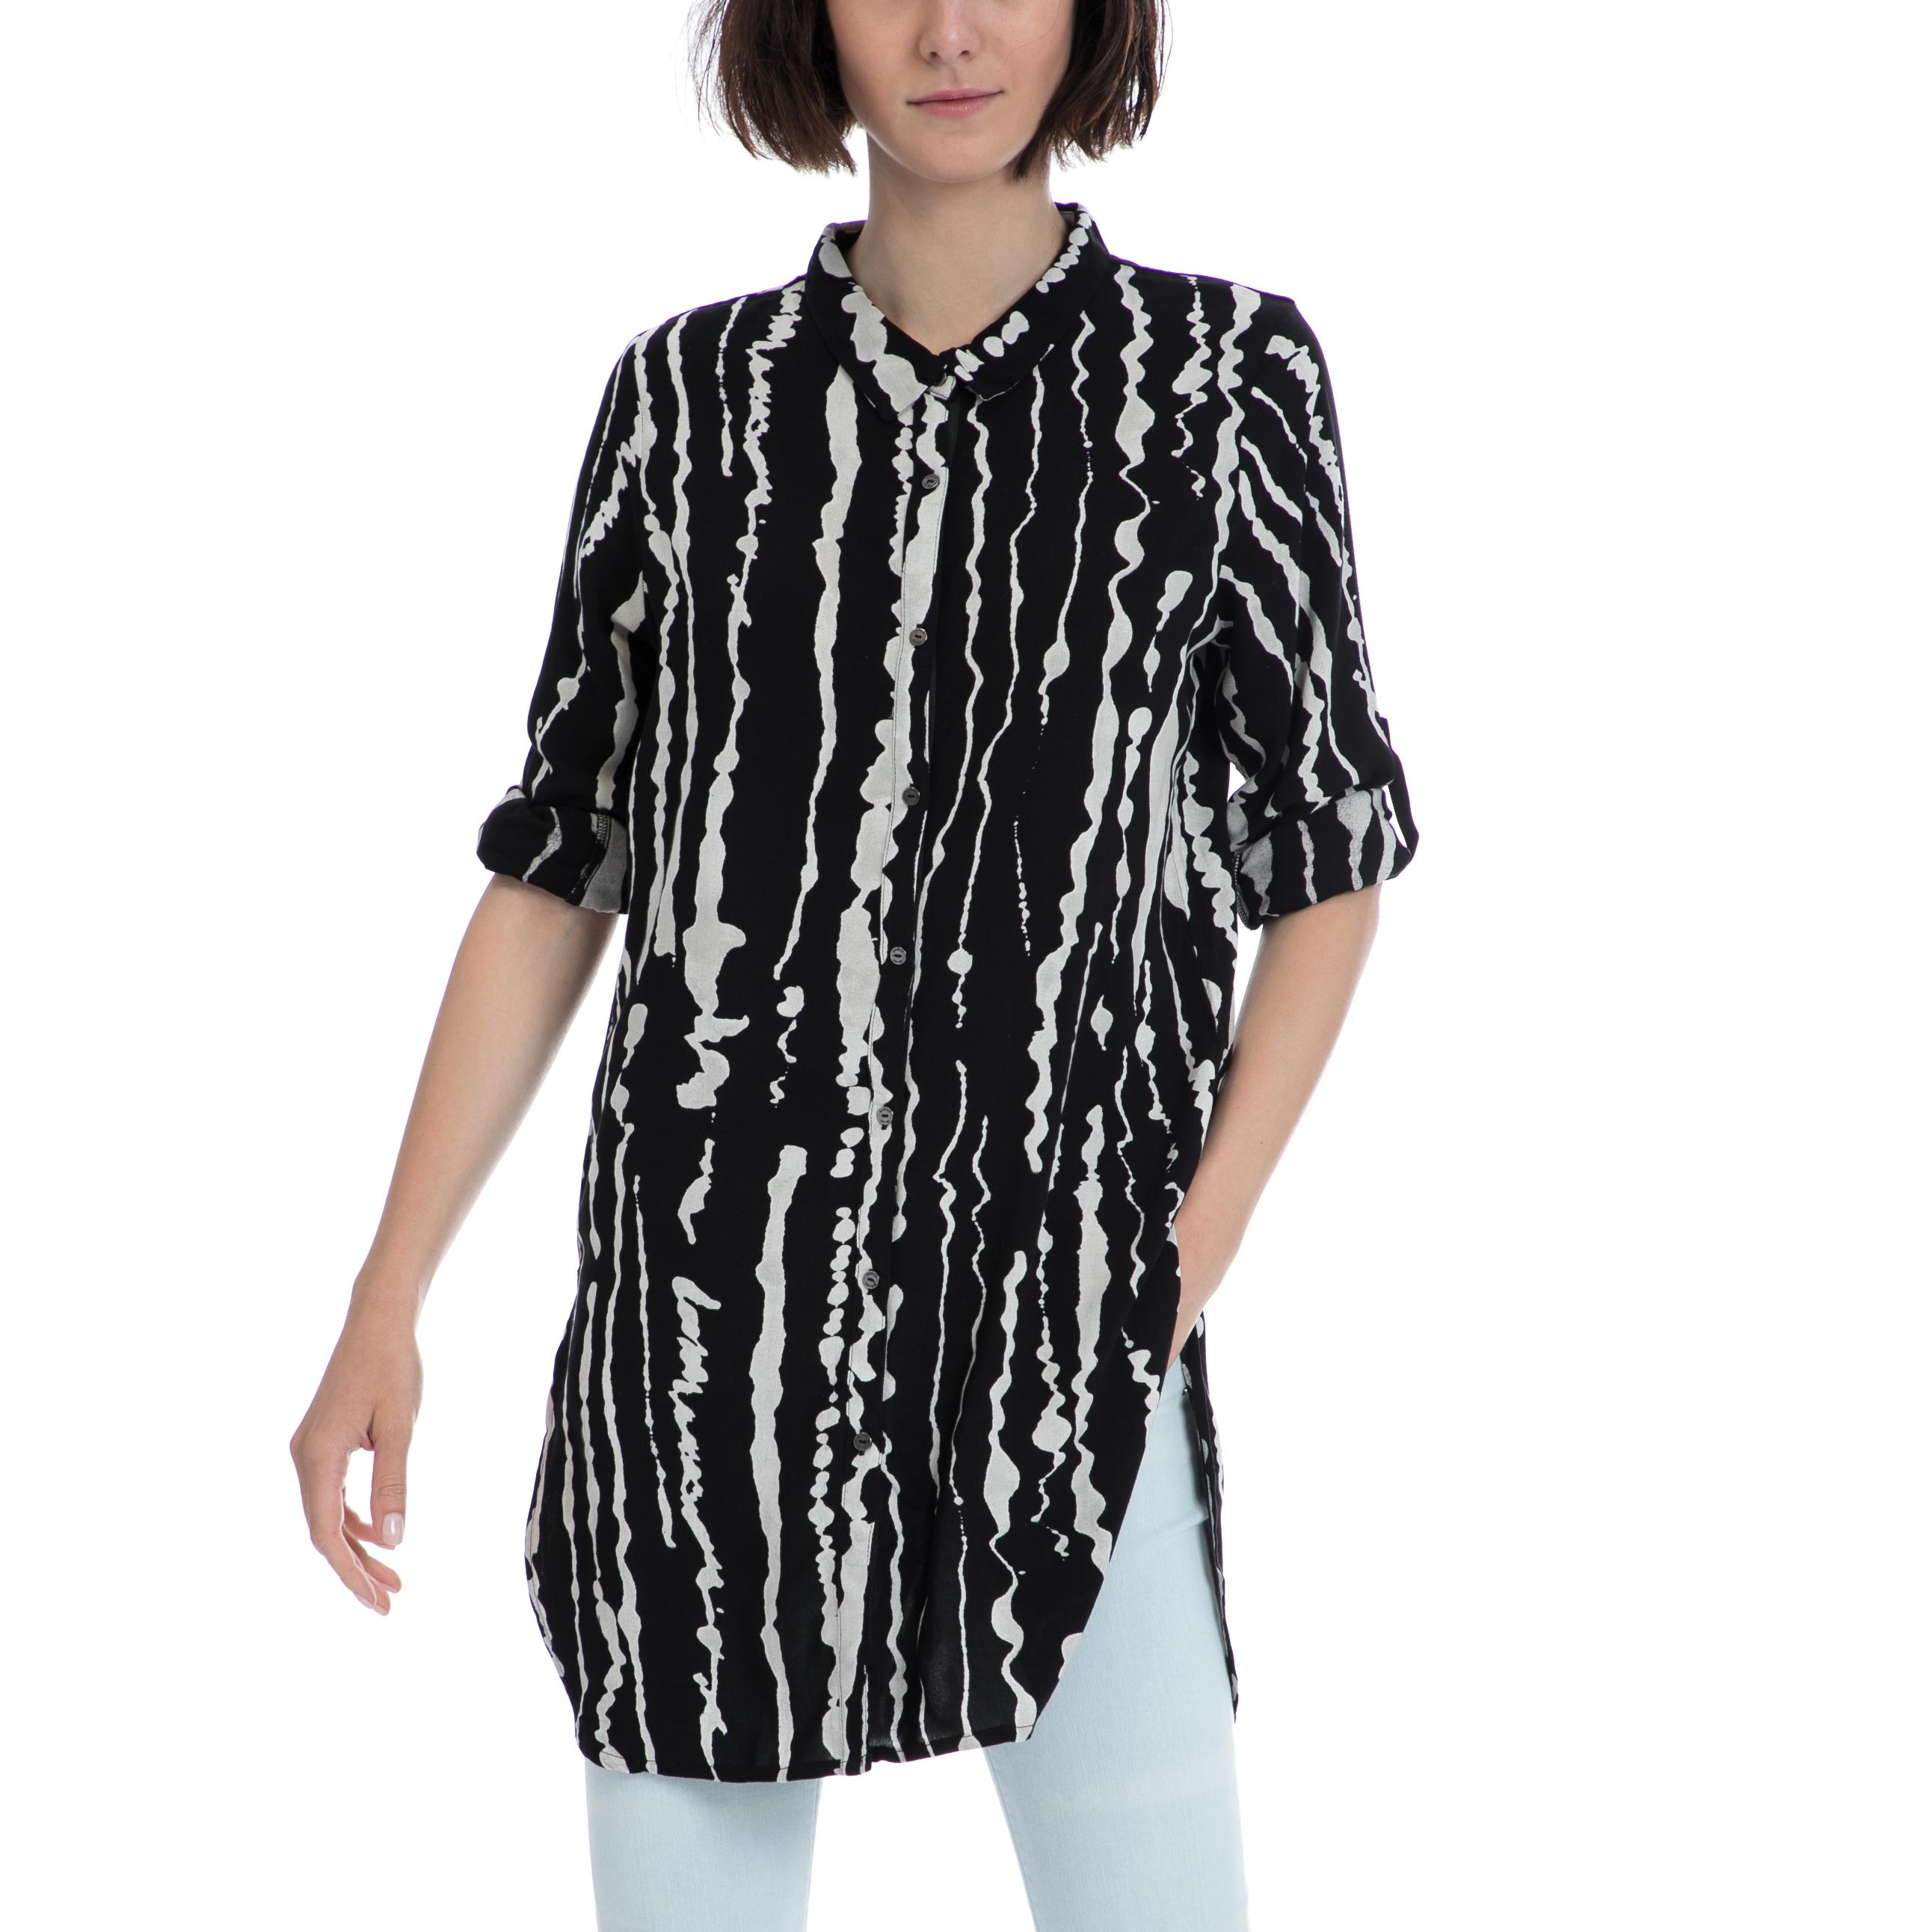 GARCIA JEANS - Γυναικεία πουκαμίσα Garcia Jeans μαύρη γυναικεία ρούχα πουκάμισα πουκαμίσες